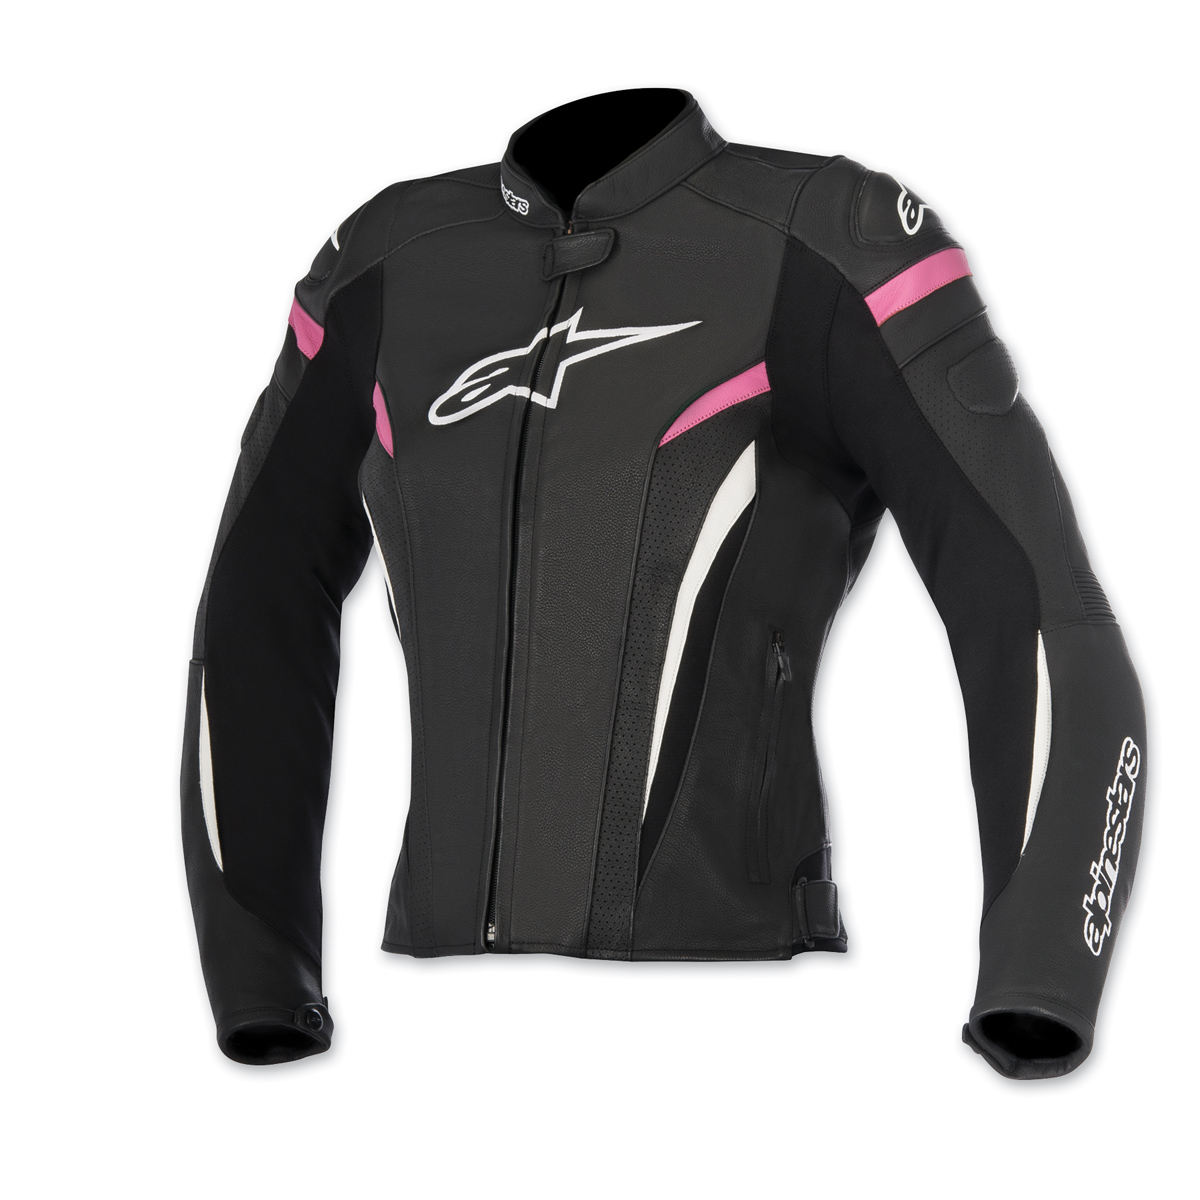 Alpinestars Women's Stella GP Plus R v2 Airflow Black/Fushia Jacket